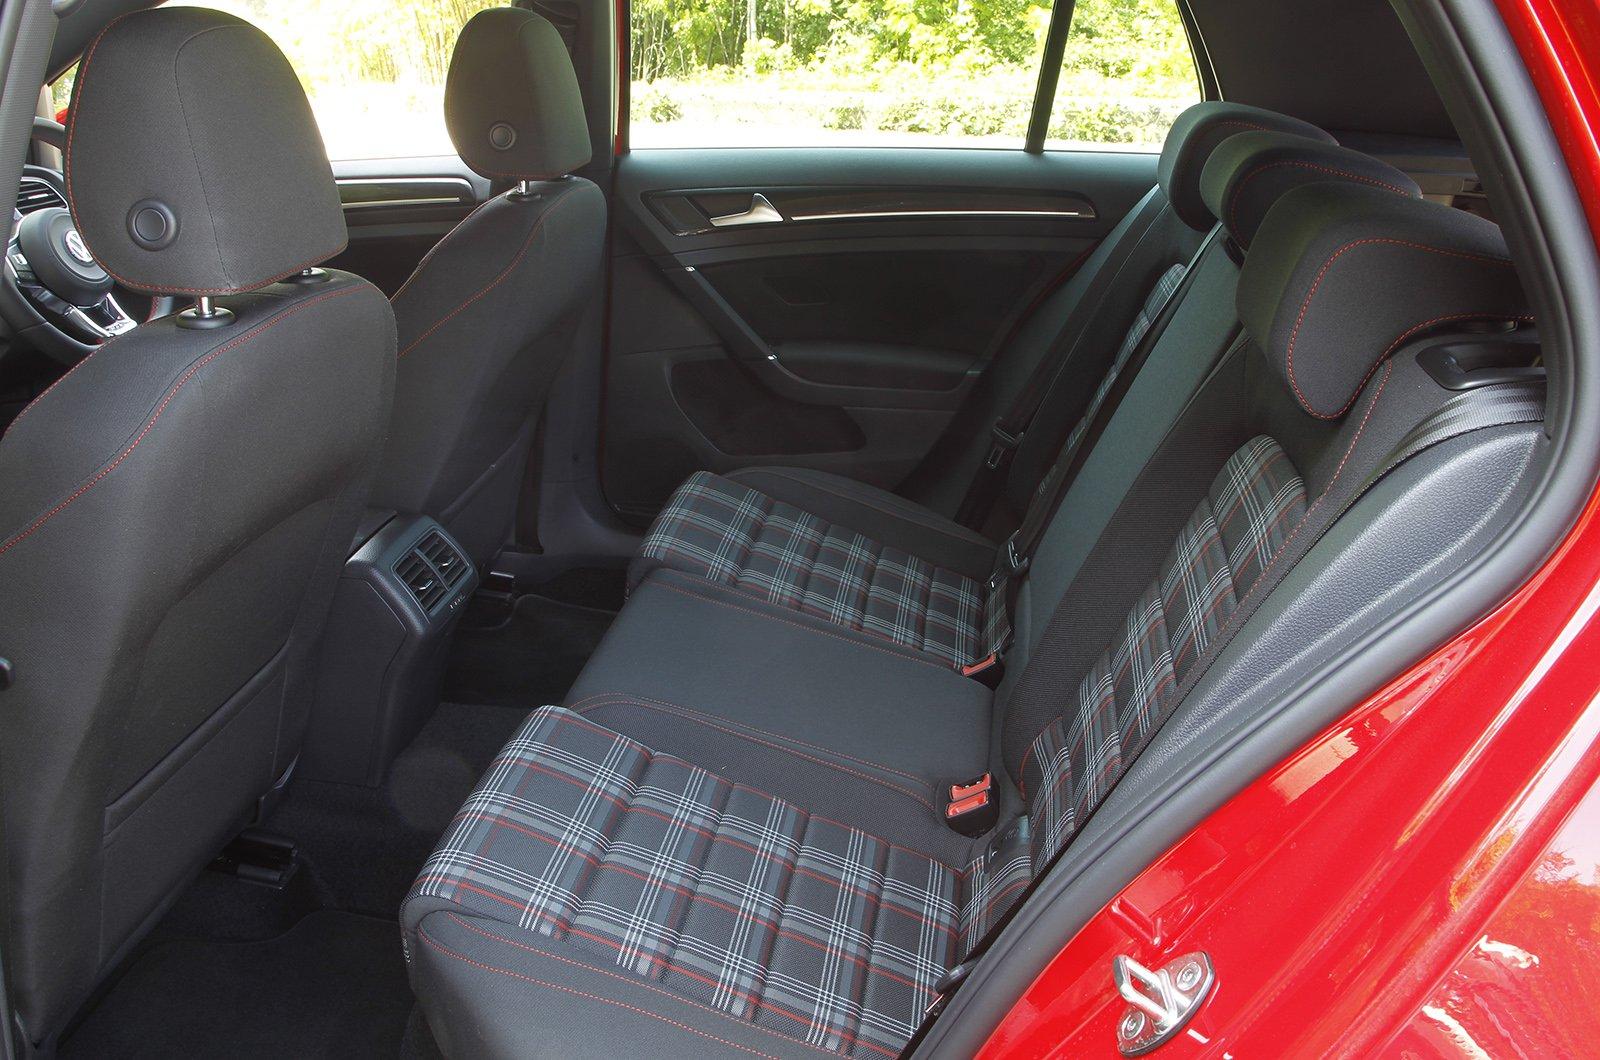 Volkswagen Golf GTI 2013-2019 rear seat